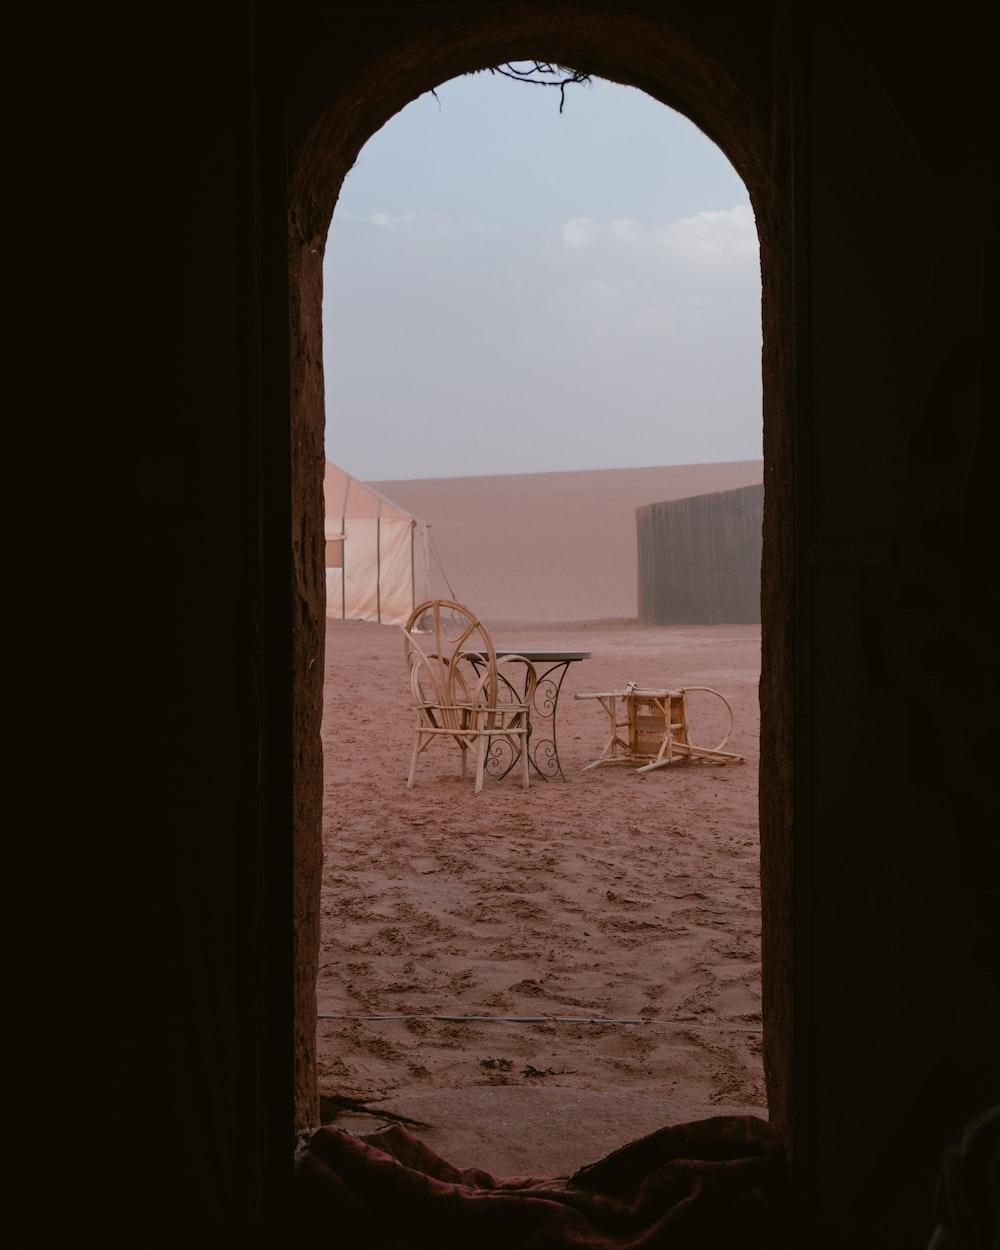 people riding camel on desert during daytime